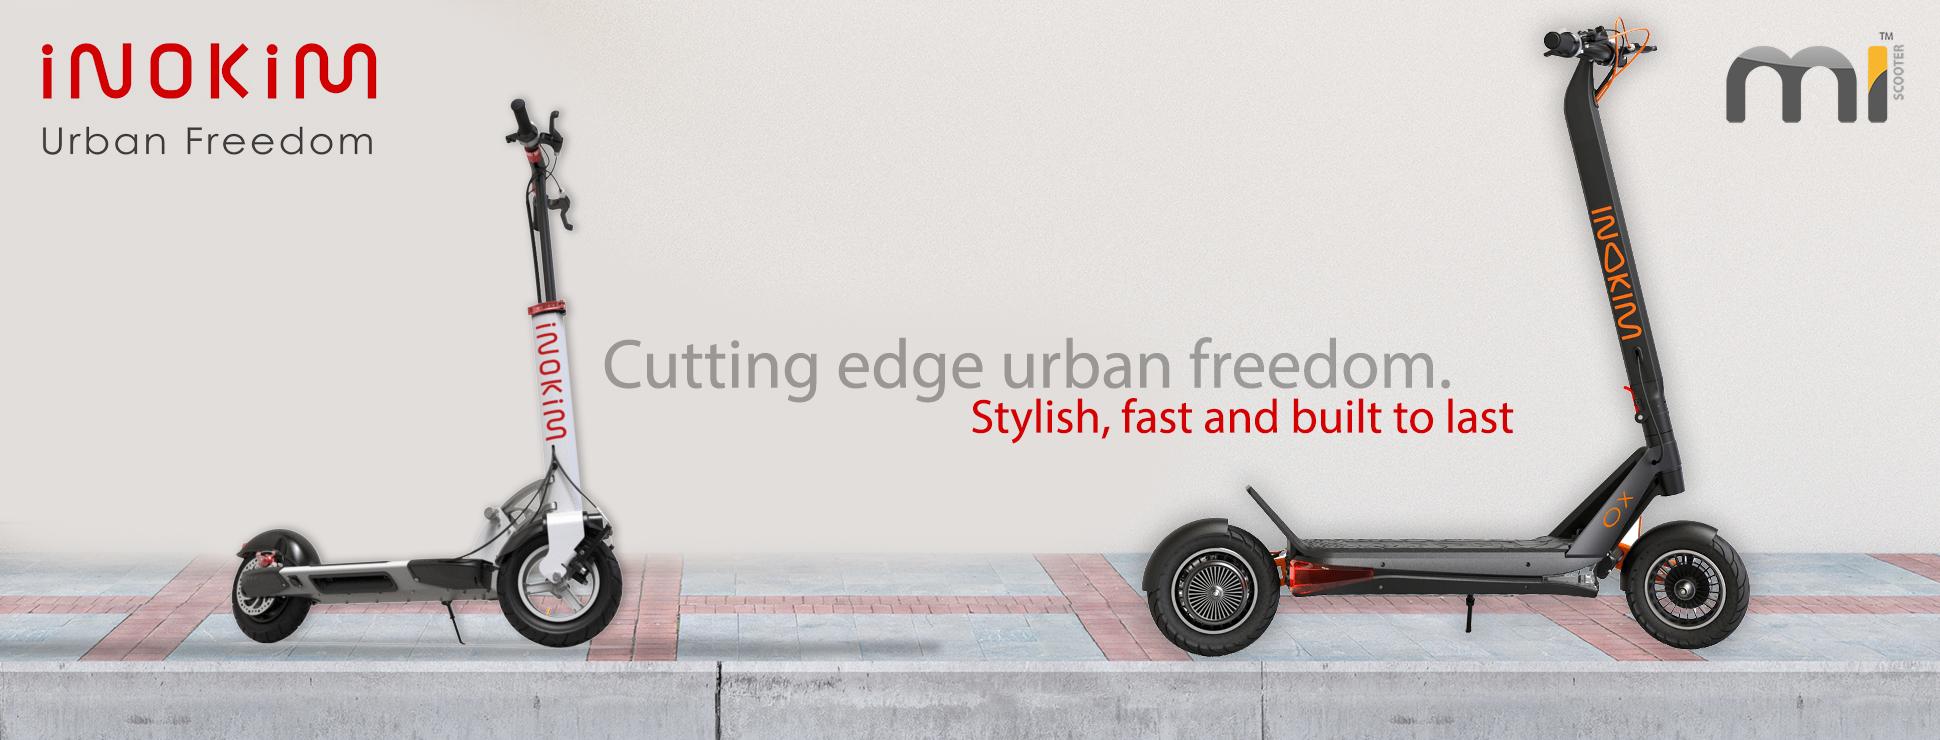 Inokim Electric Scooters - Mi Scooter UK - East Midlands - Authorised UK Sales